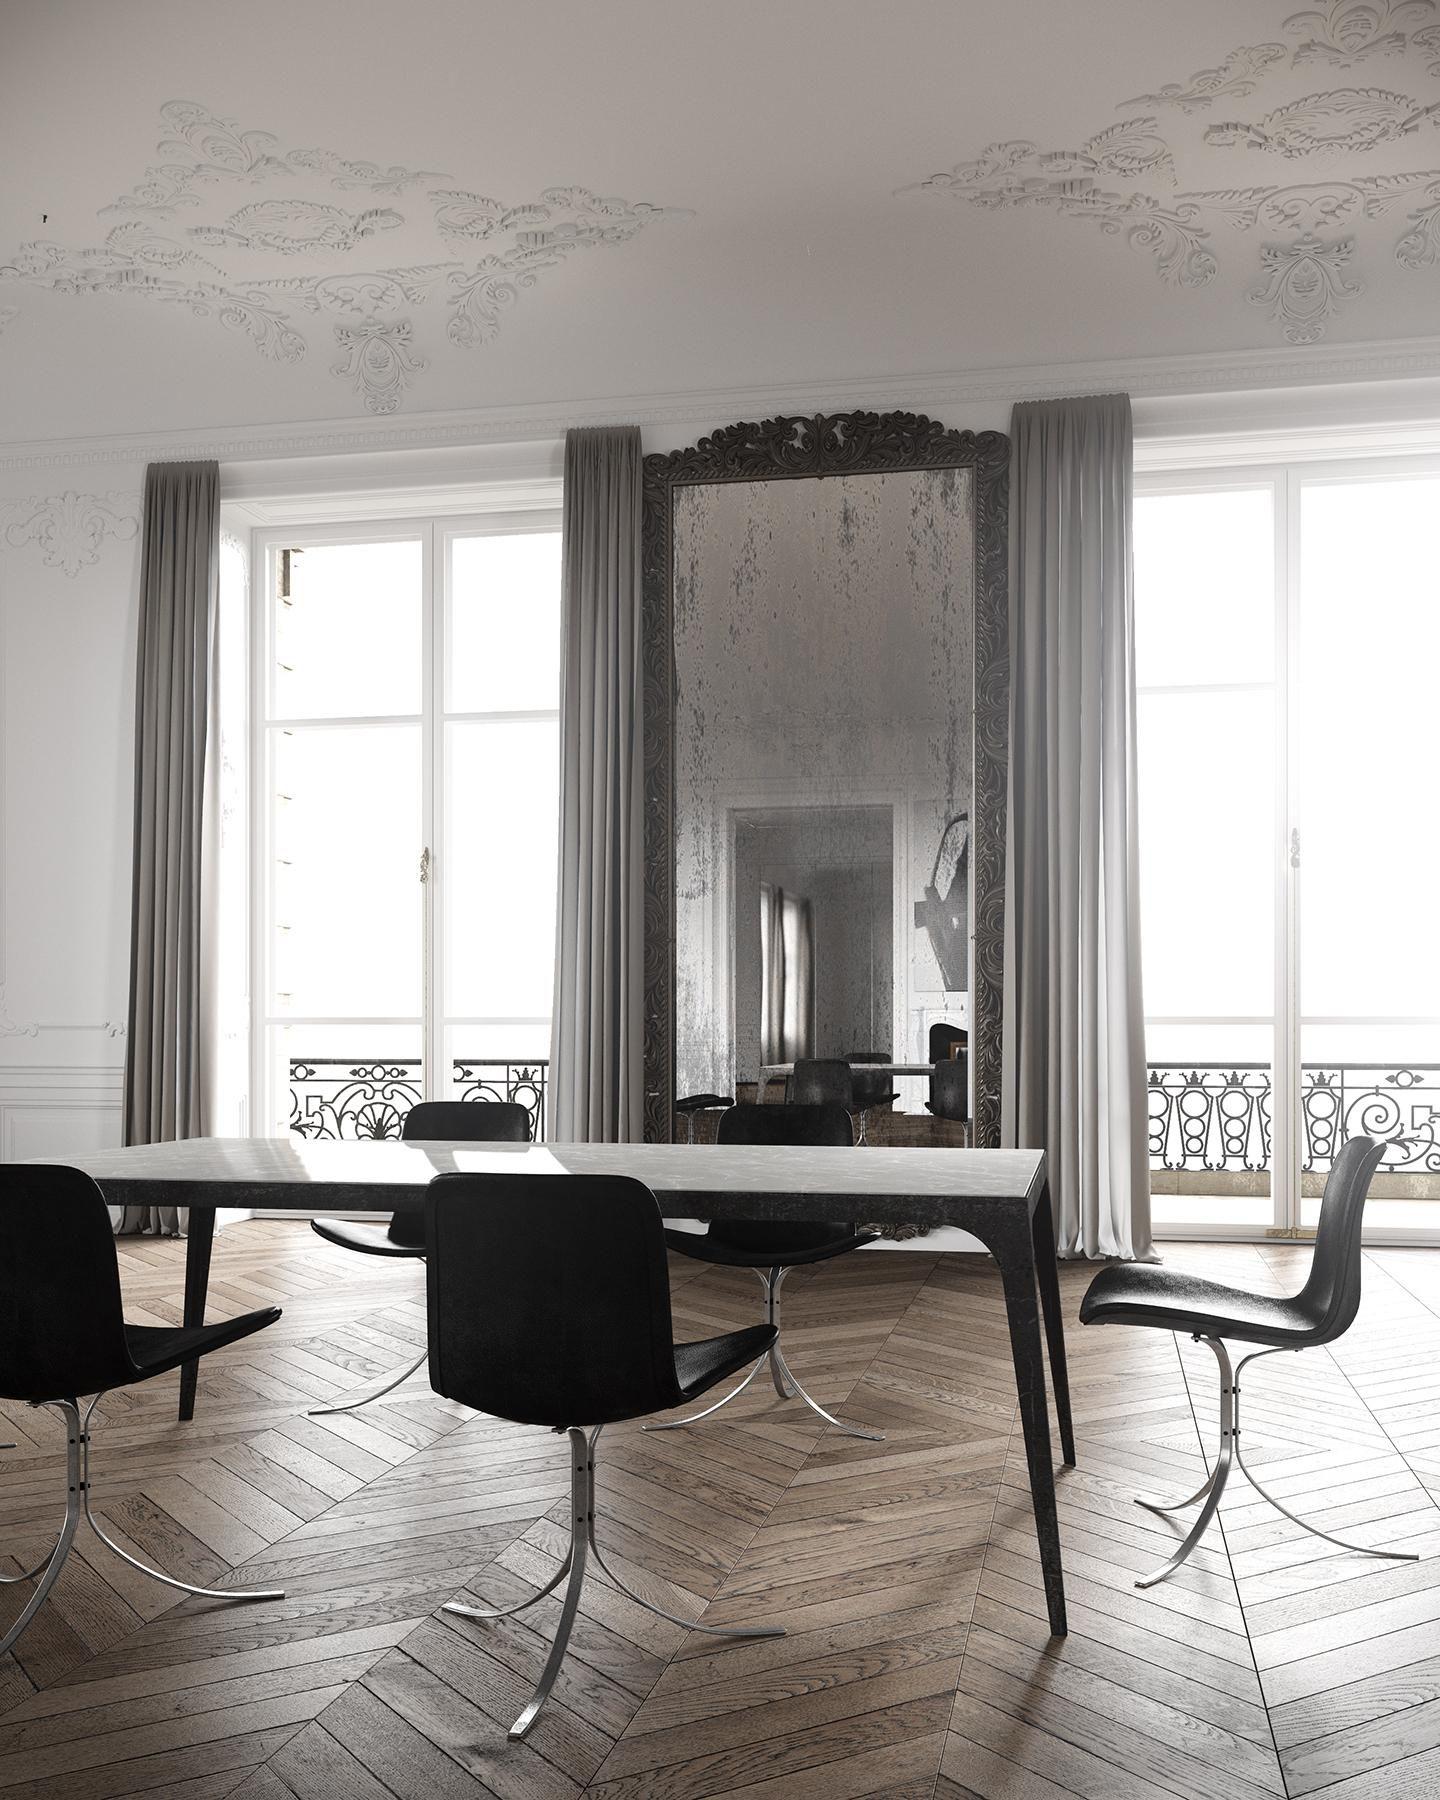 jessica vedel - Google Search | Beautiful Interiors | Pinterest